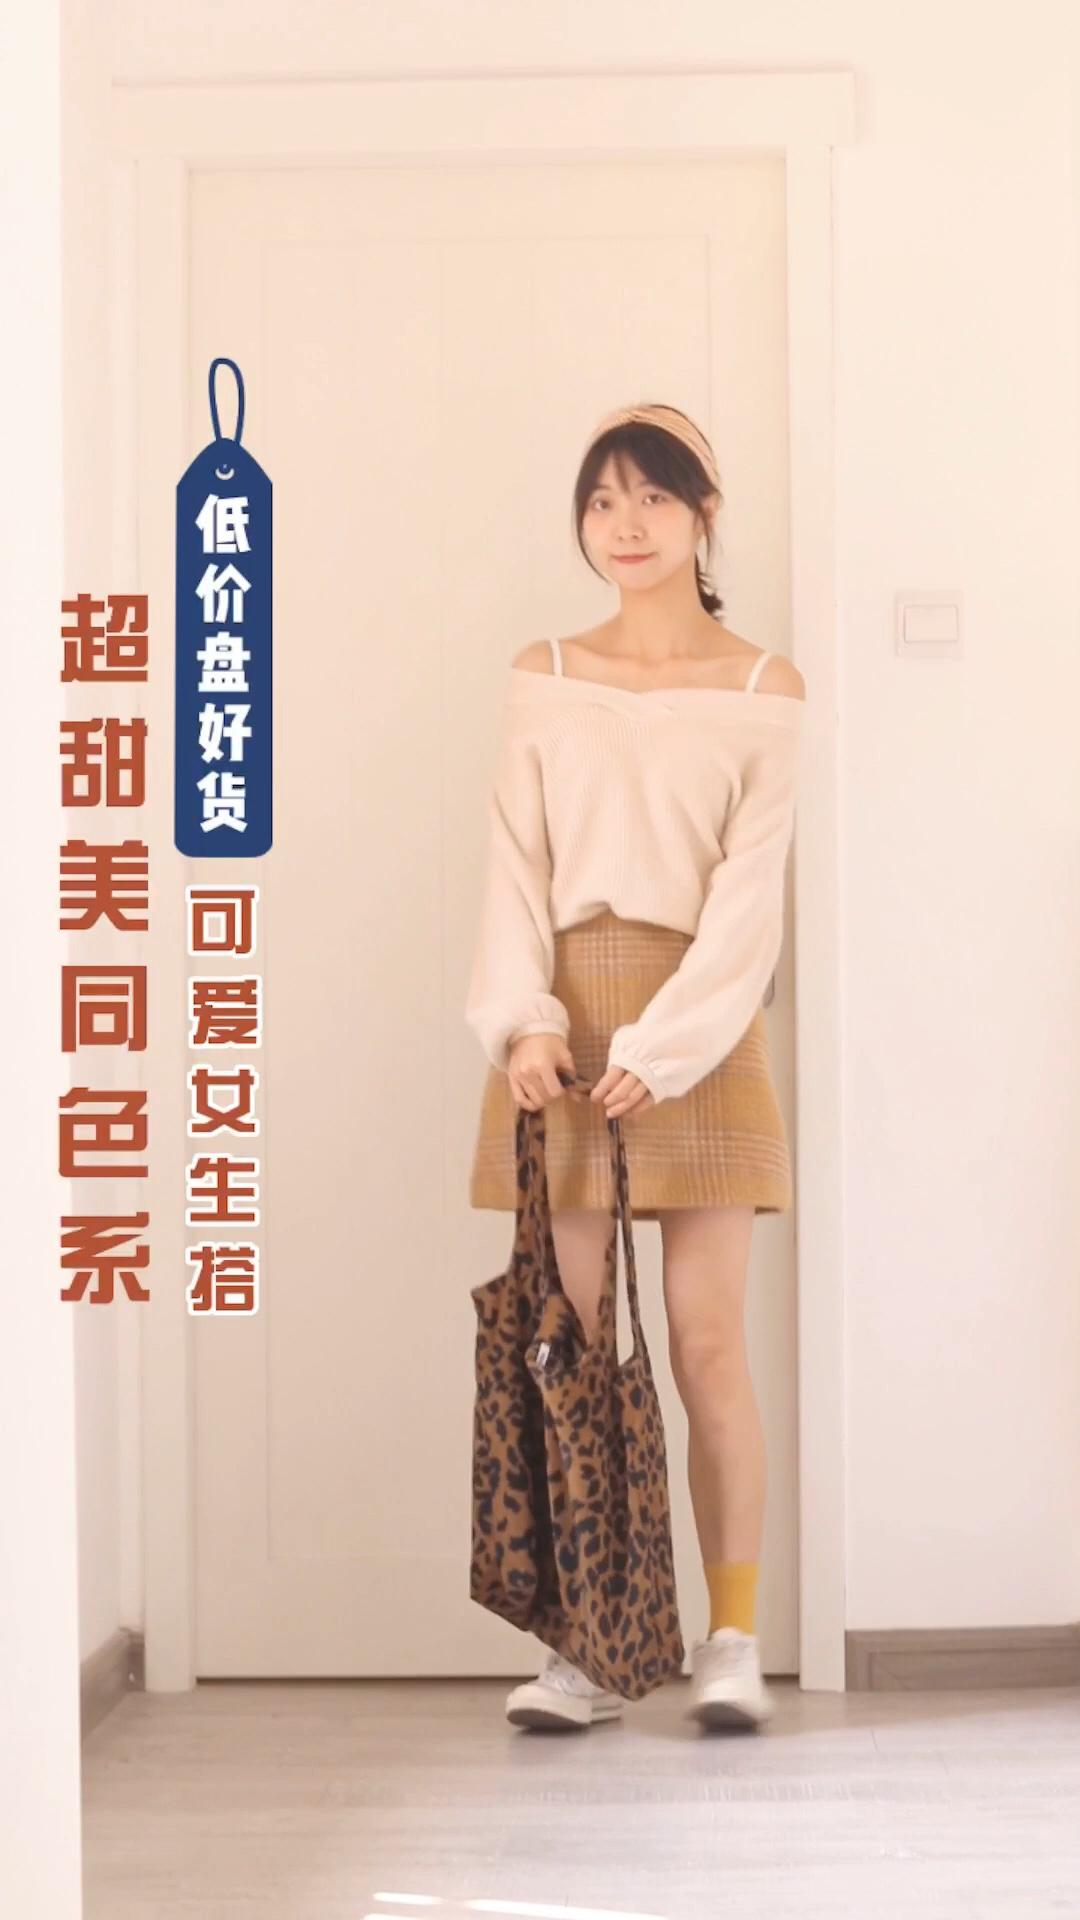 """福利!粉丝来找我领取双十一优惠券啦,戳🔗 https://h5.mogu.com/coupon/receive.html?marketType=market_mogujie&pid=1hv61jeug https://h5.mogu.com/coupon/receive.html?marketType=market_mogujie&pid=1hv61jeug https://h5.mogu.com/coupon/receive.html?marketType=market_mogujie&pid=1hv61jeug #双十一最受欢迎女生穿搭#"